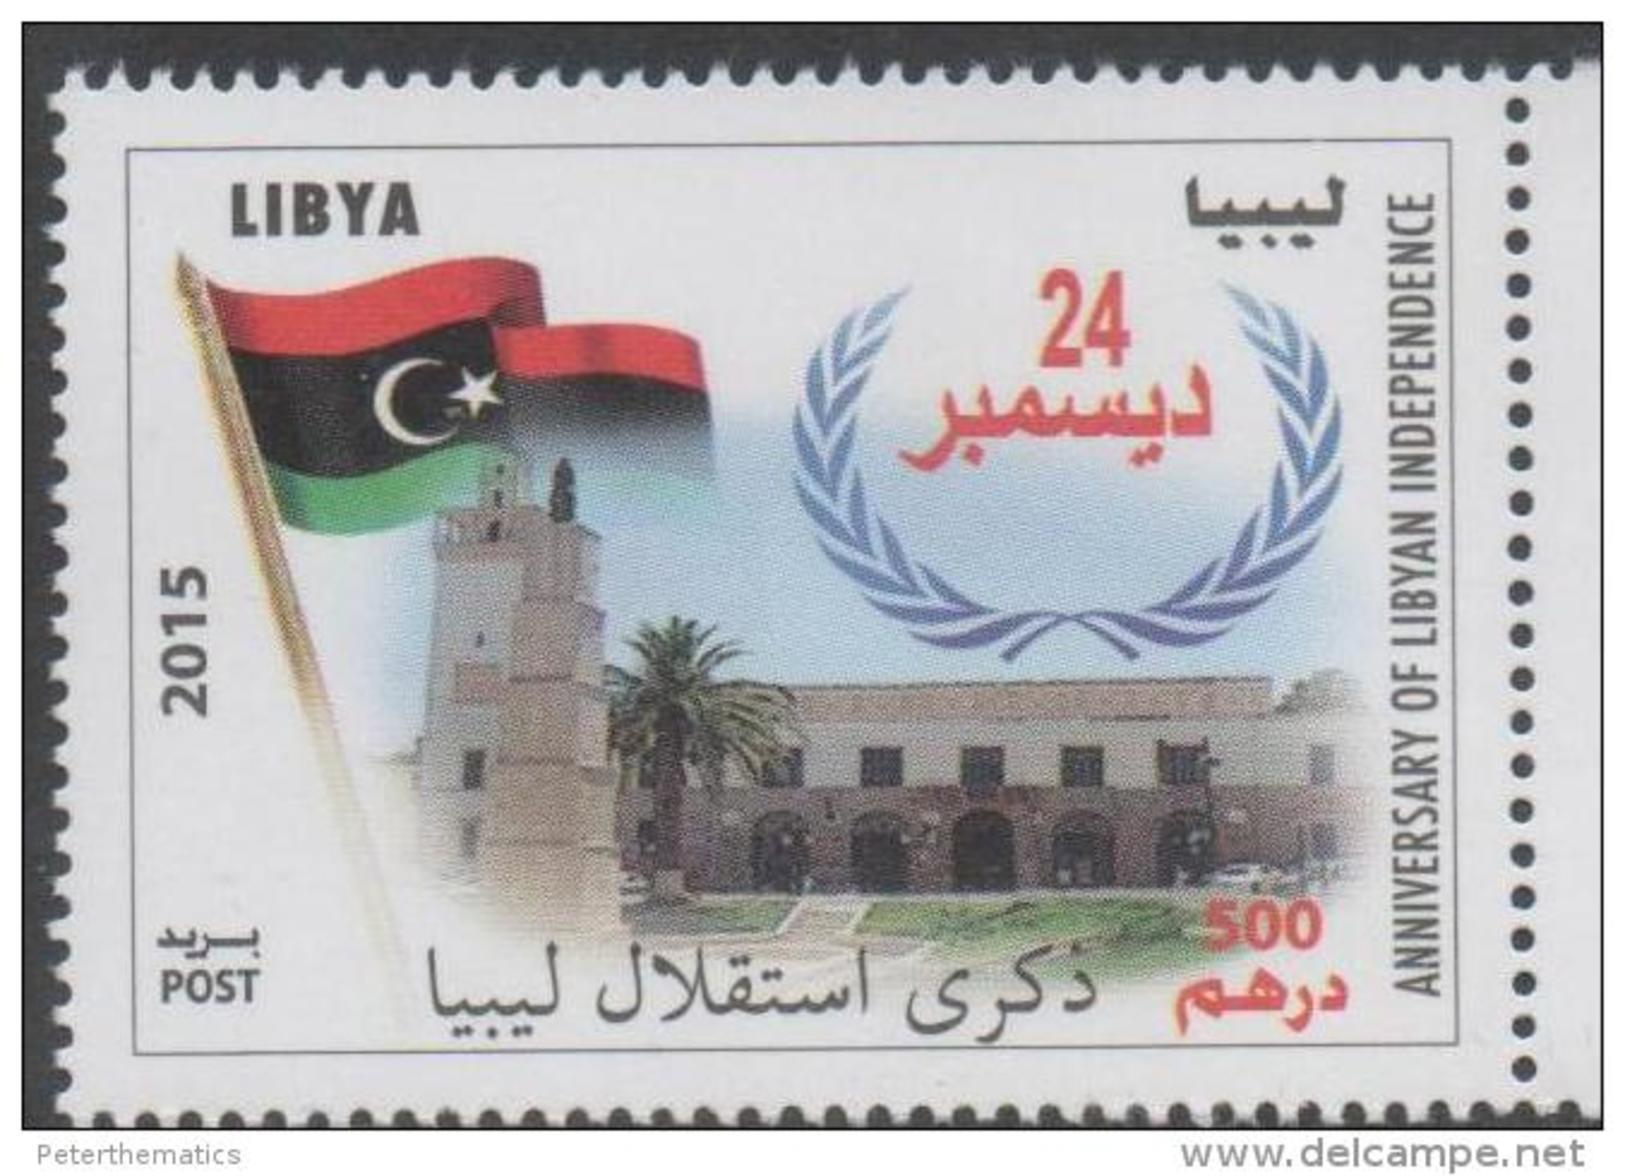 LIBYA,2015, MNH,ANNIVERSARY OF LIBYAN INDEPENDENCE,FLAGS, 1v - Postzegels